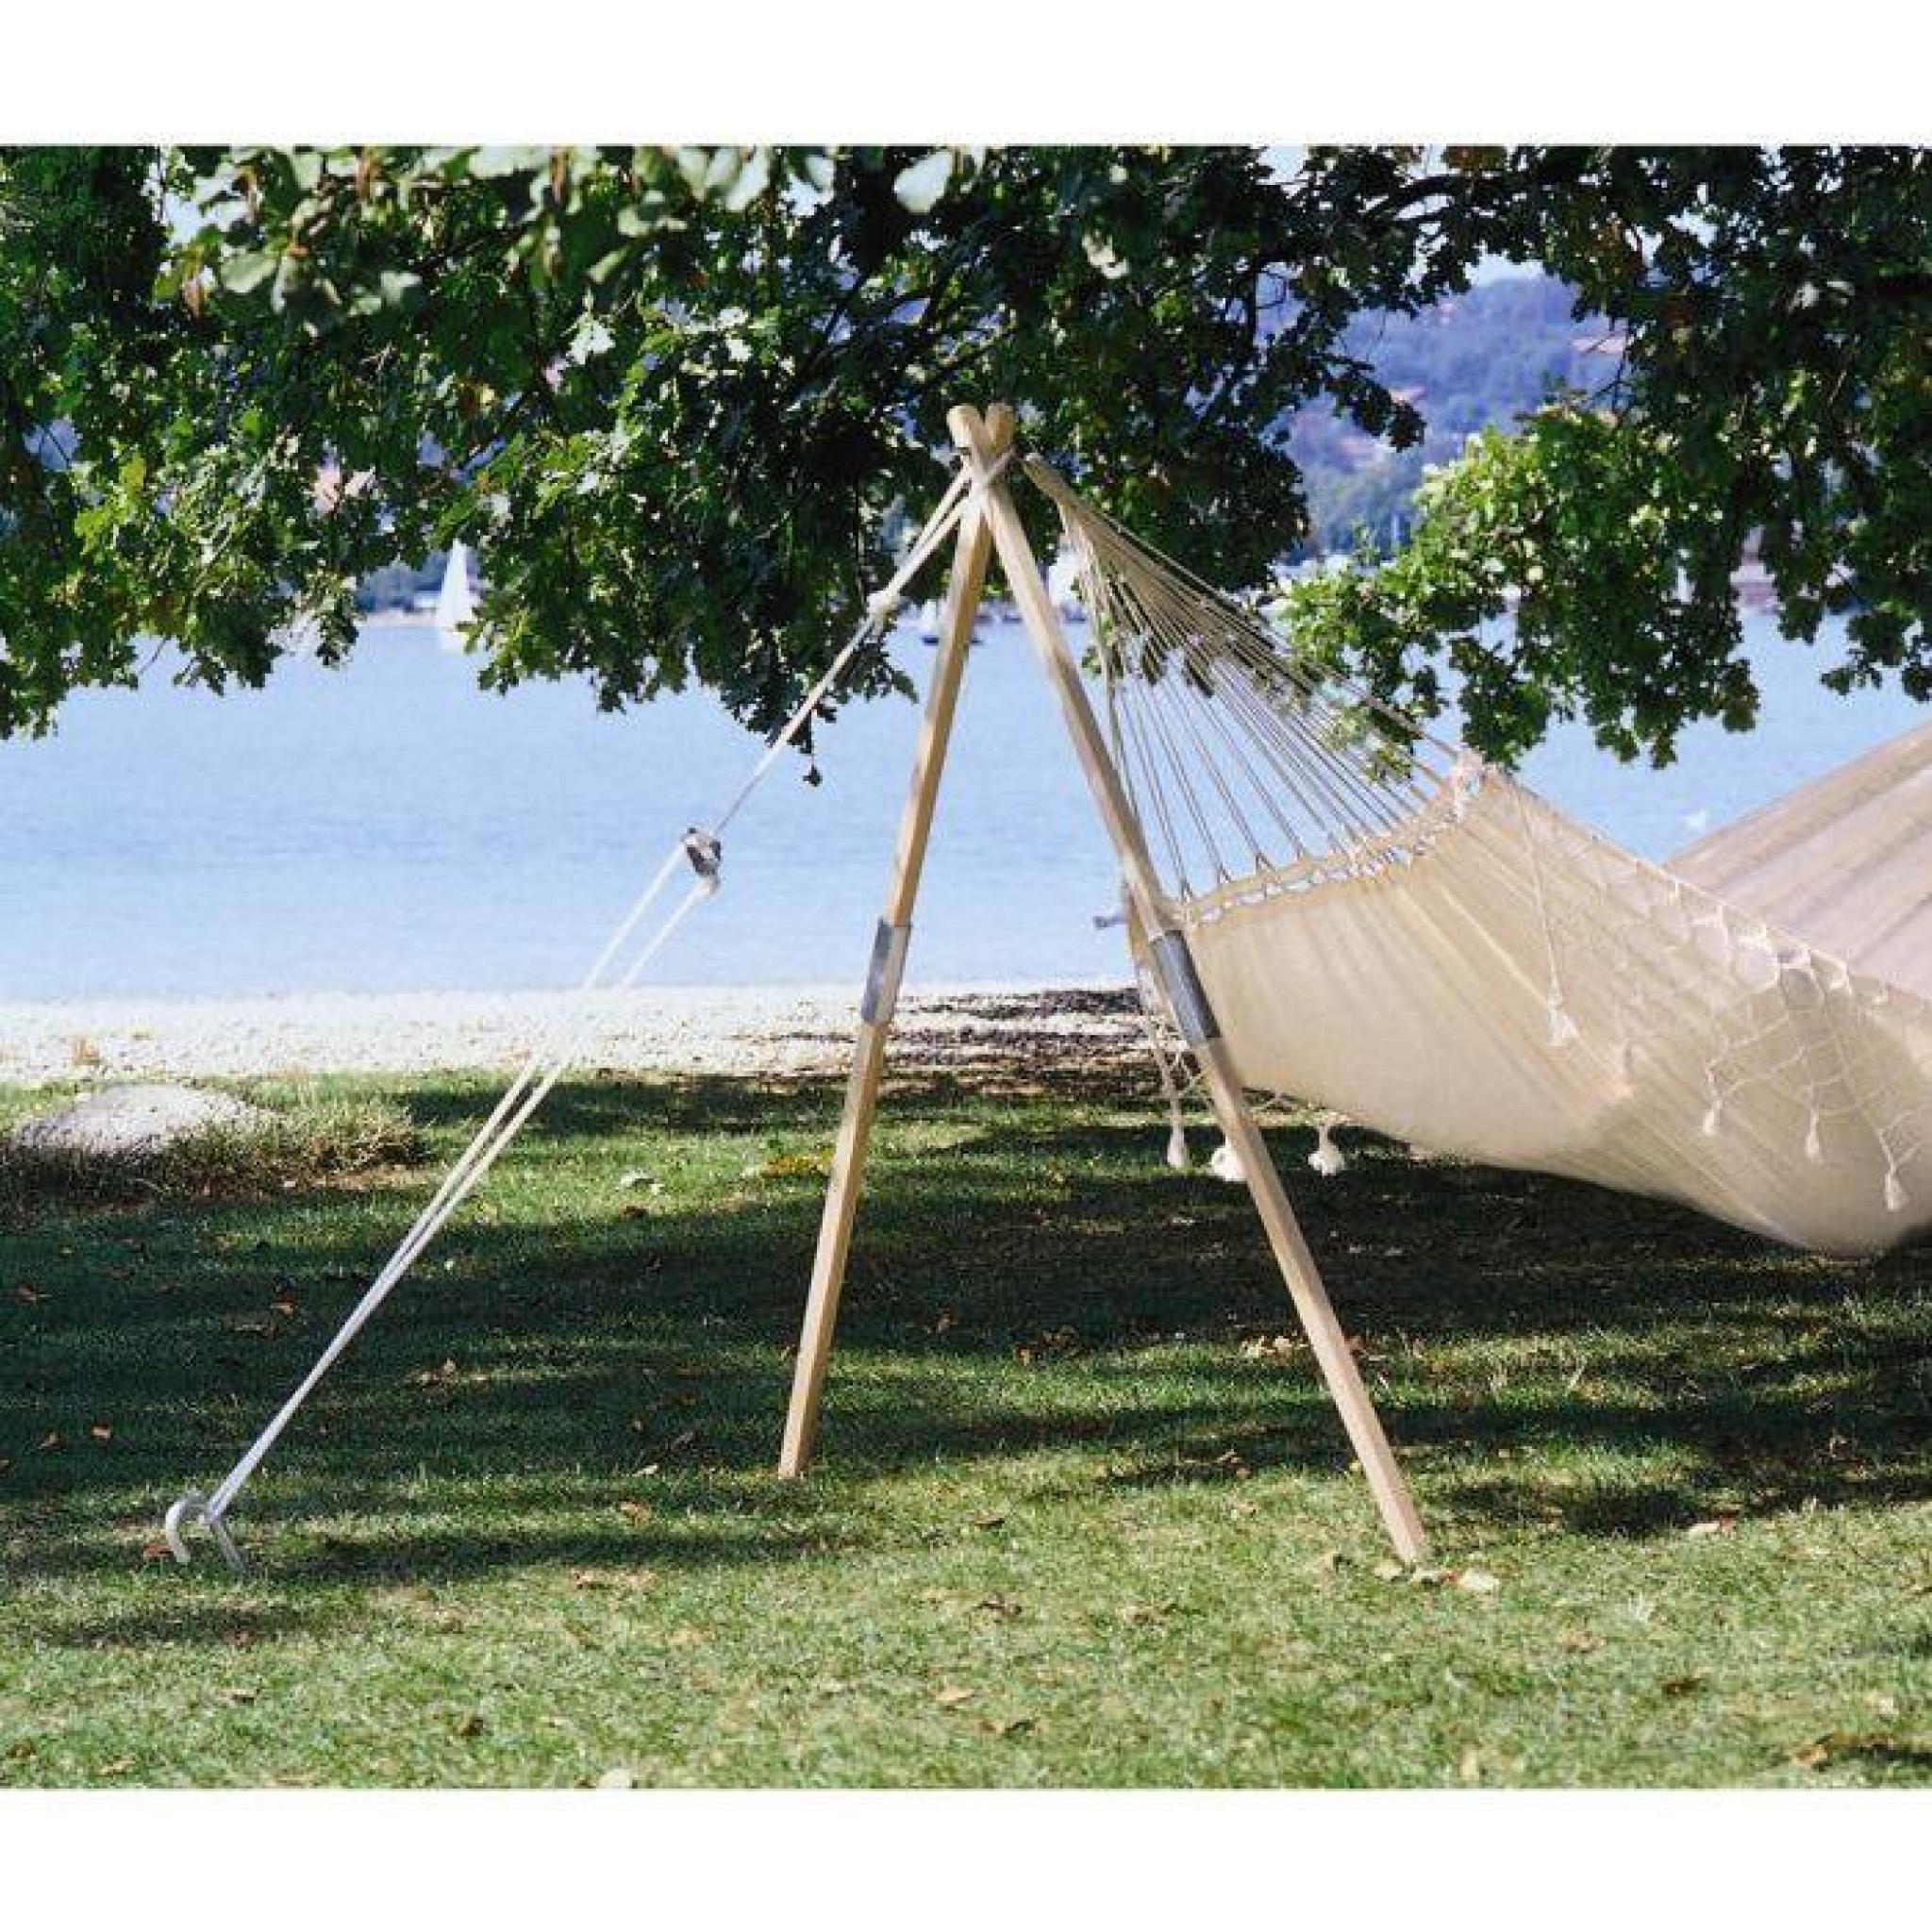 amazonas support hamac en bois madera achat vente hamac avec support pas cher coindujardin com